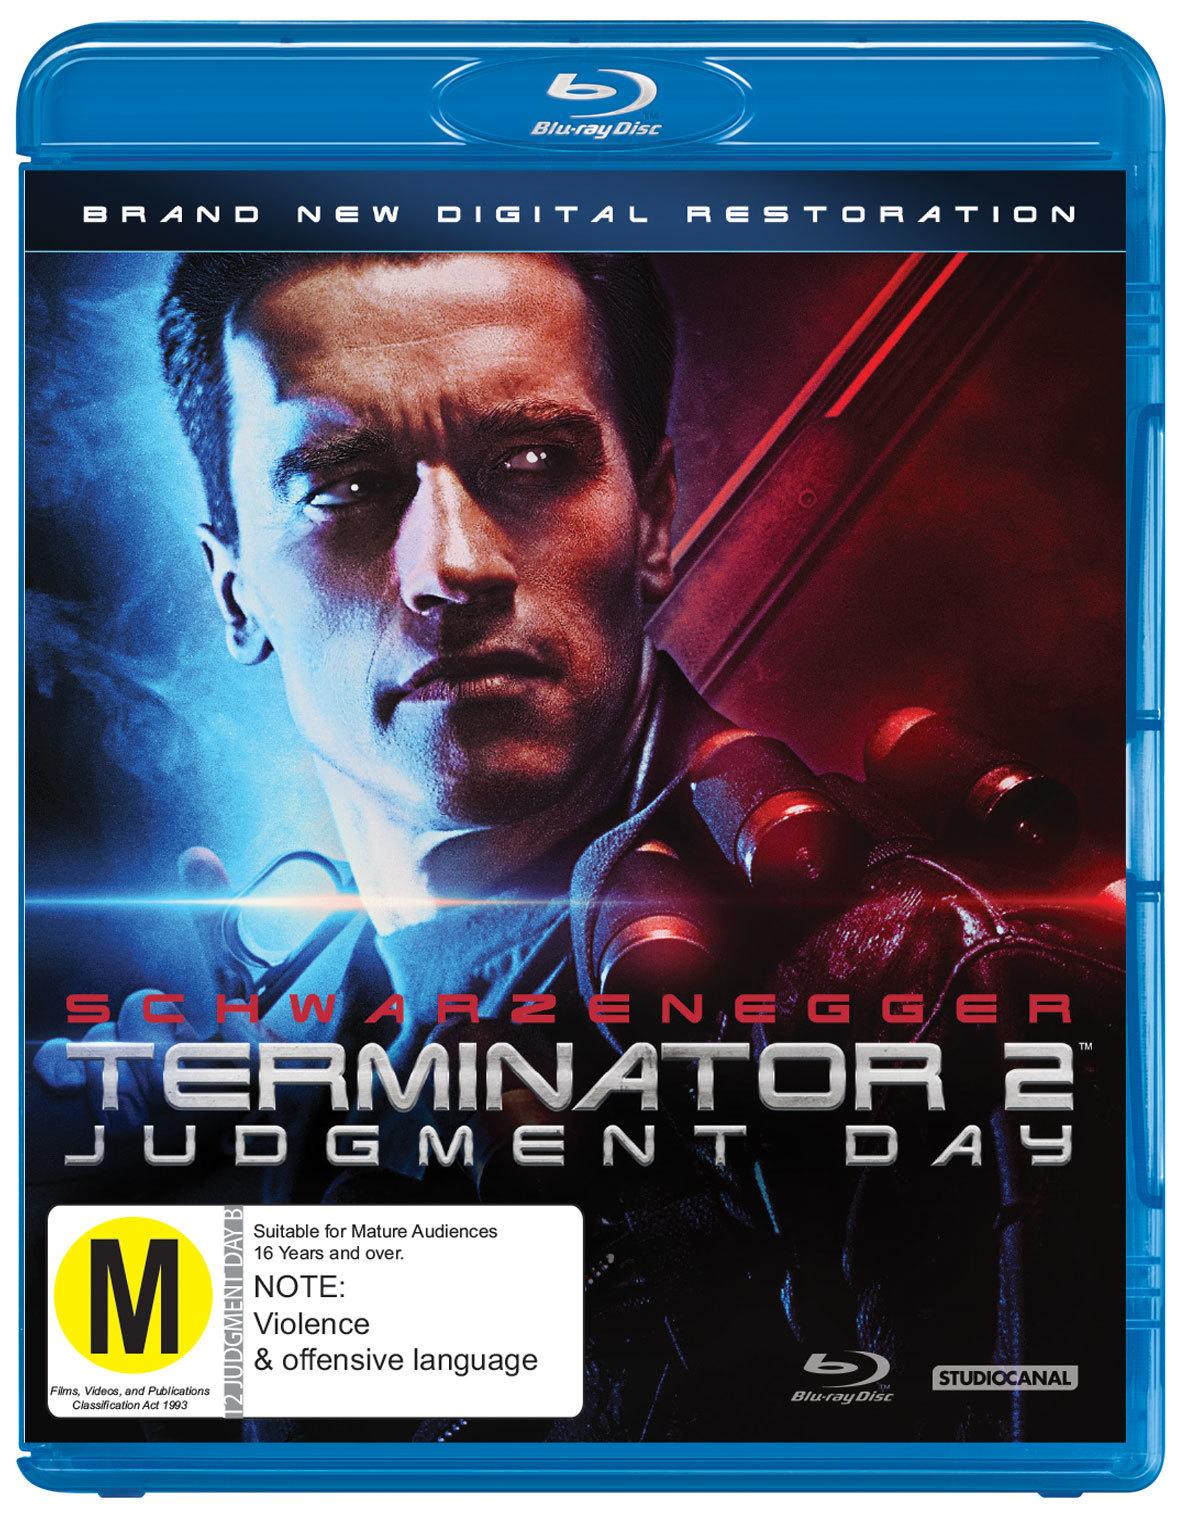 Terminator 2: Judgement Day on Blu-ray image